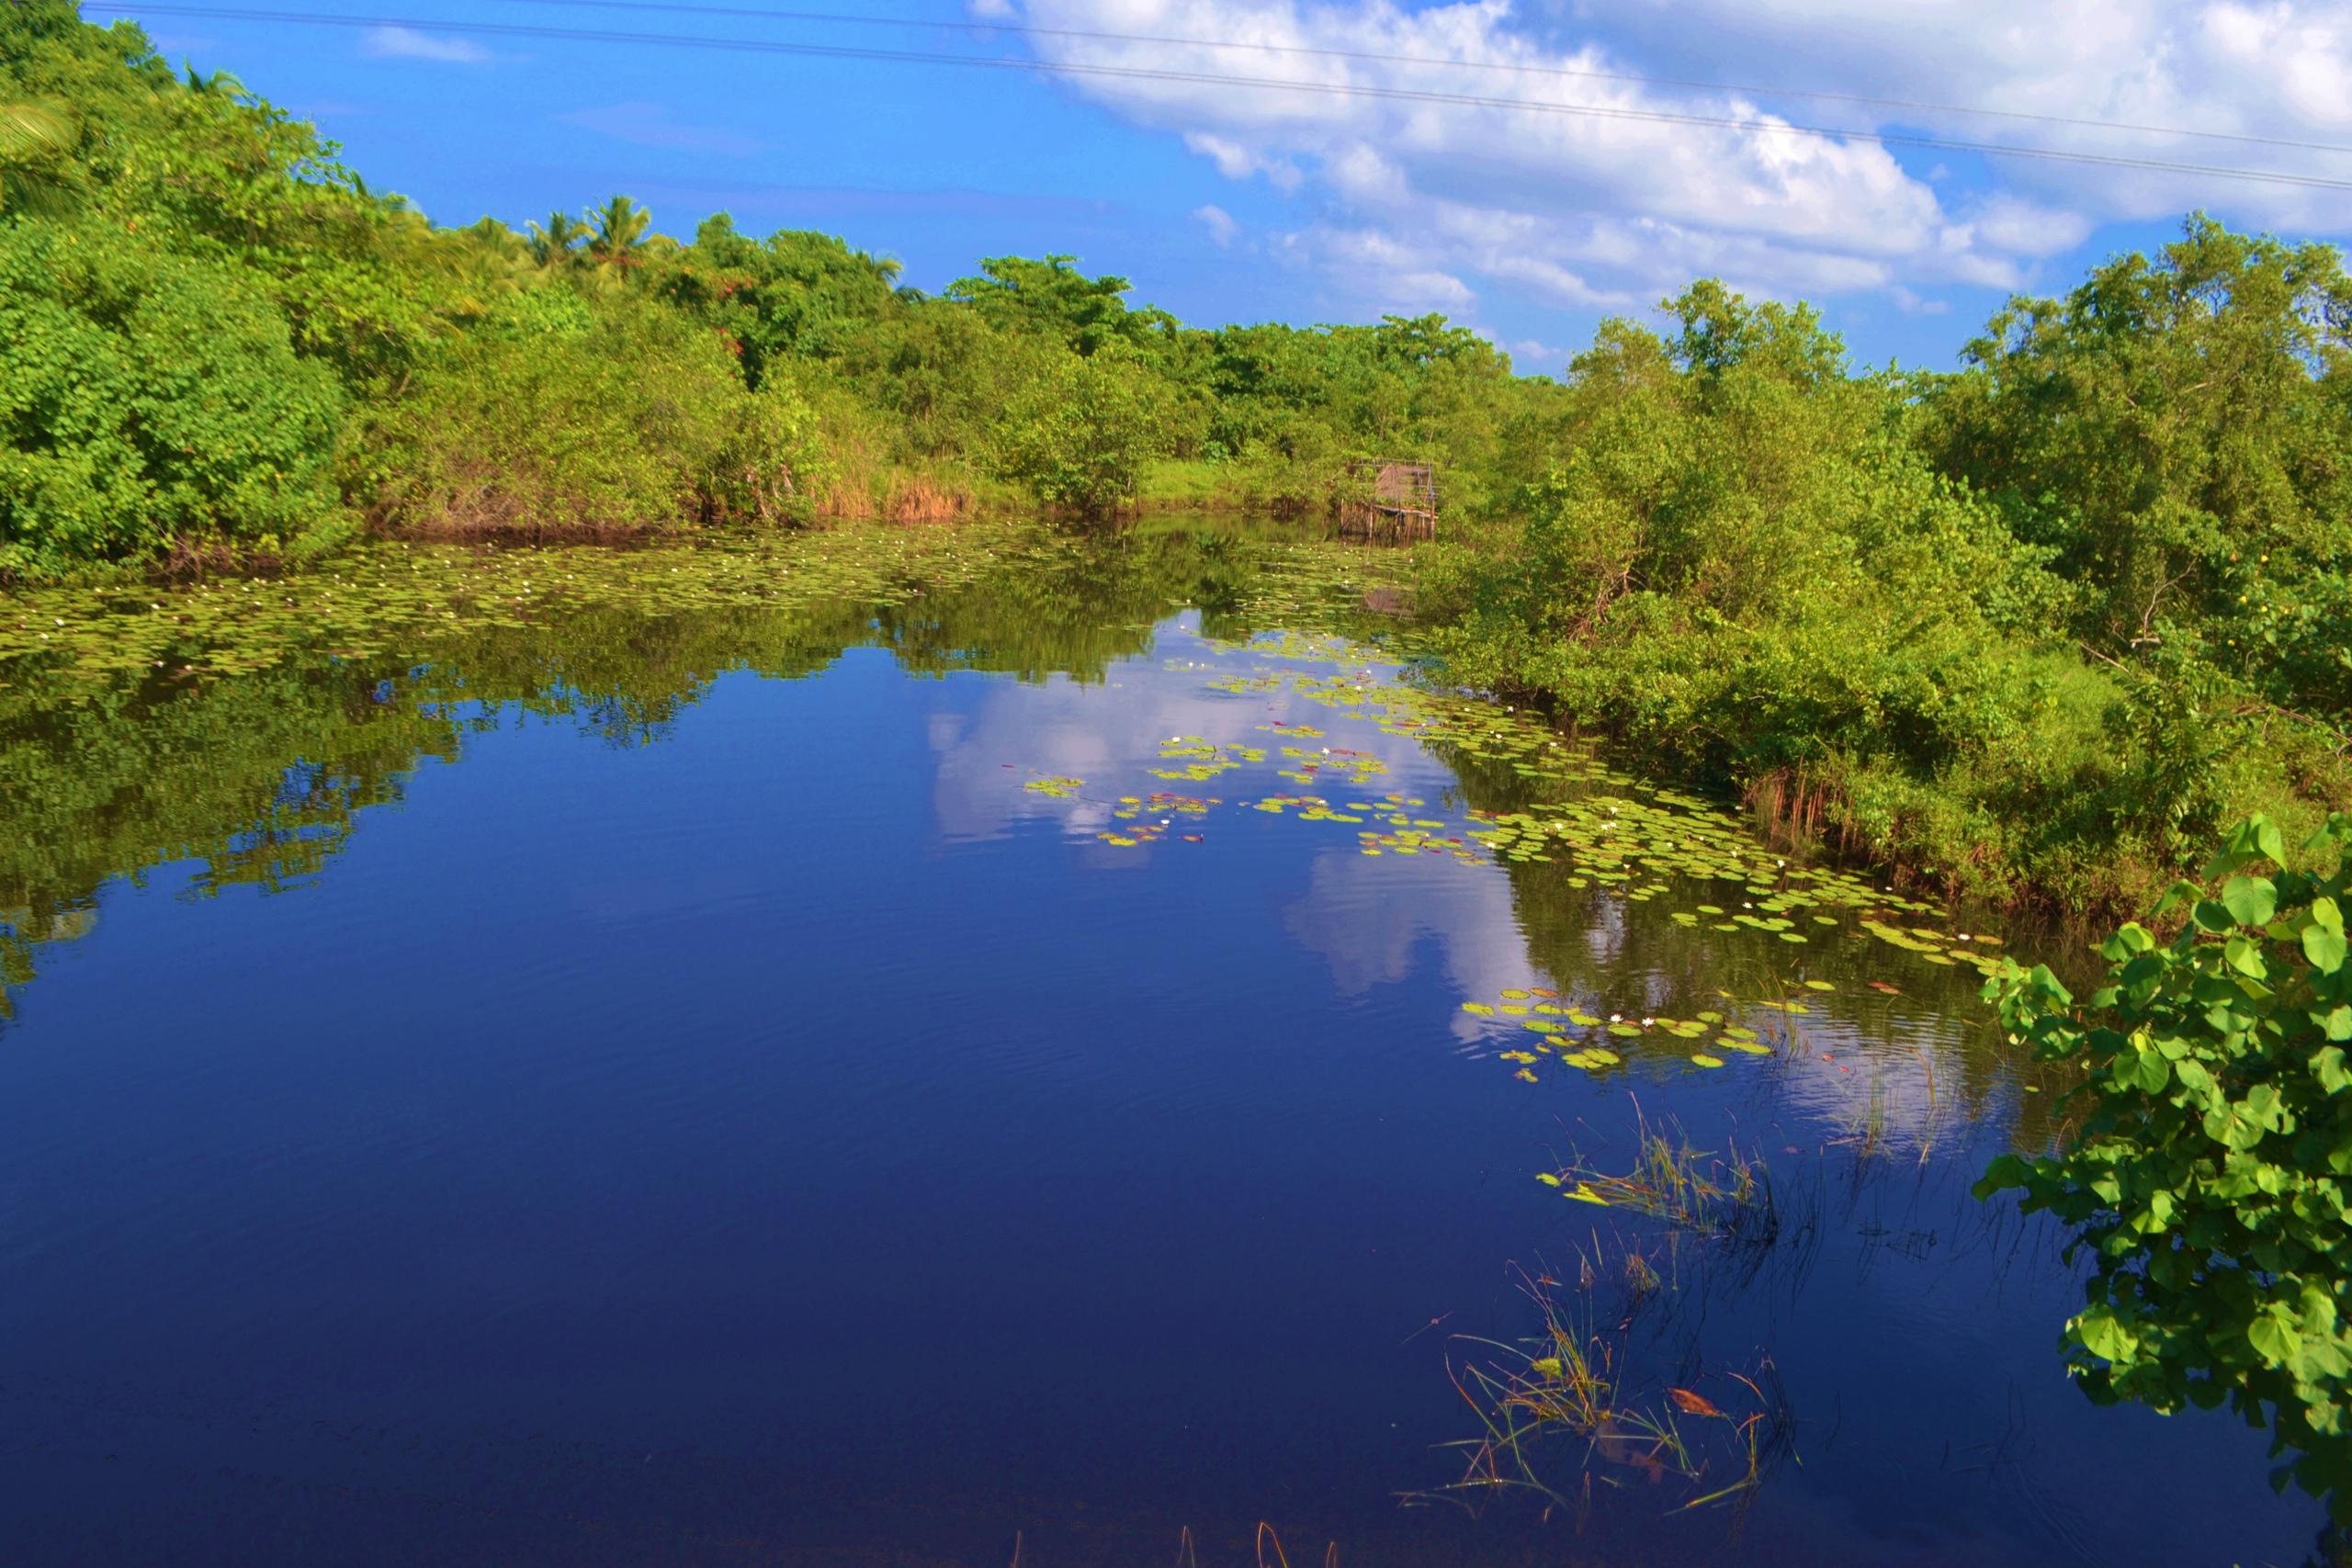 Шри Ланка (фото) - Страница 2 KAyAD3TKbwc